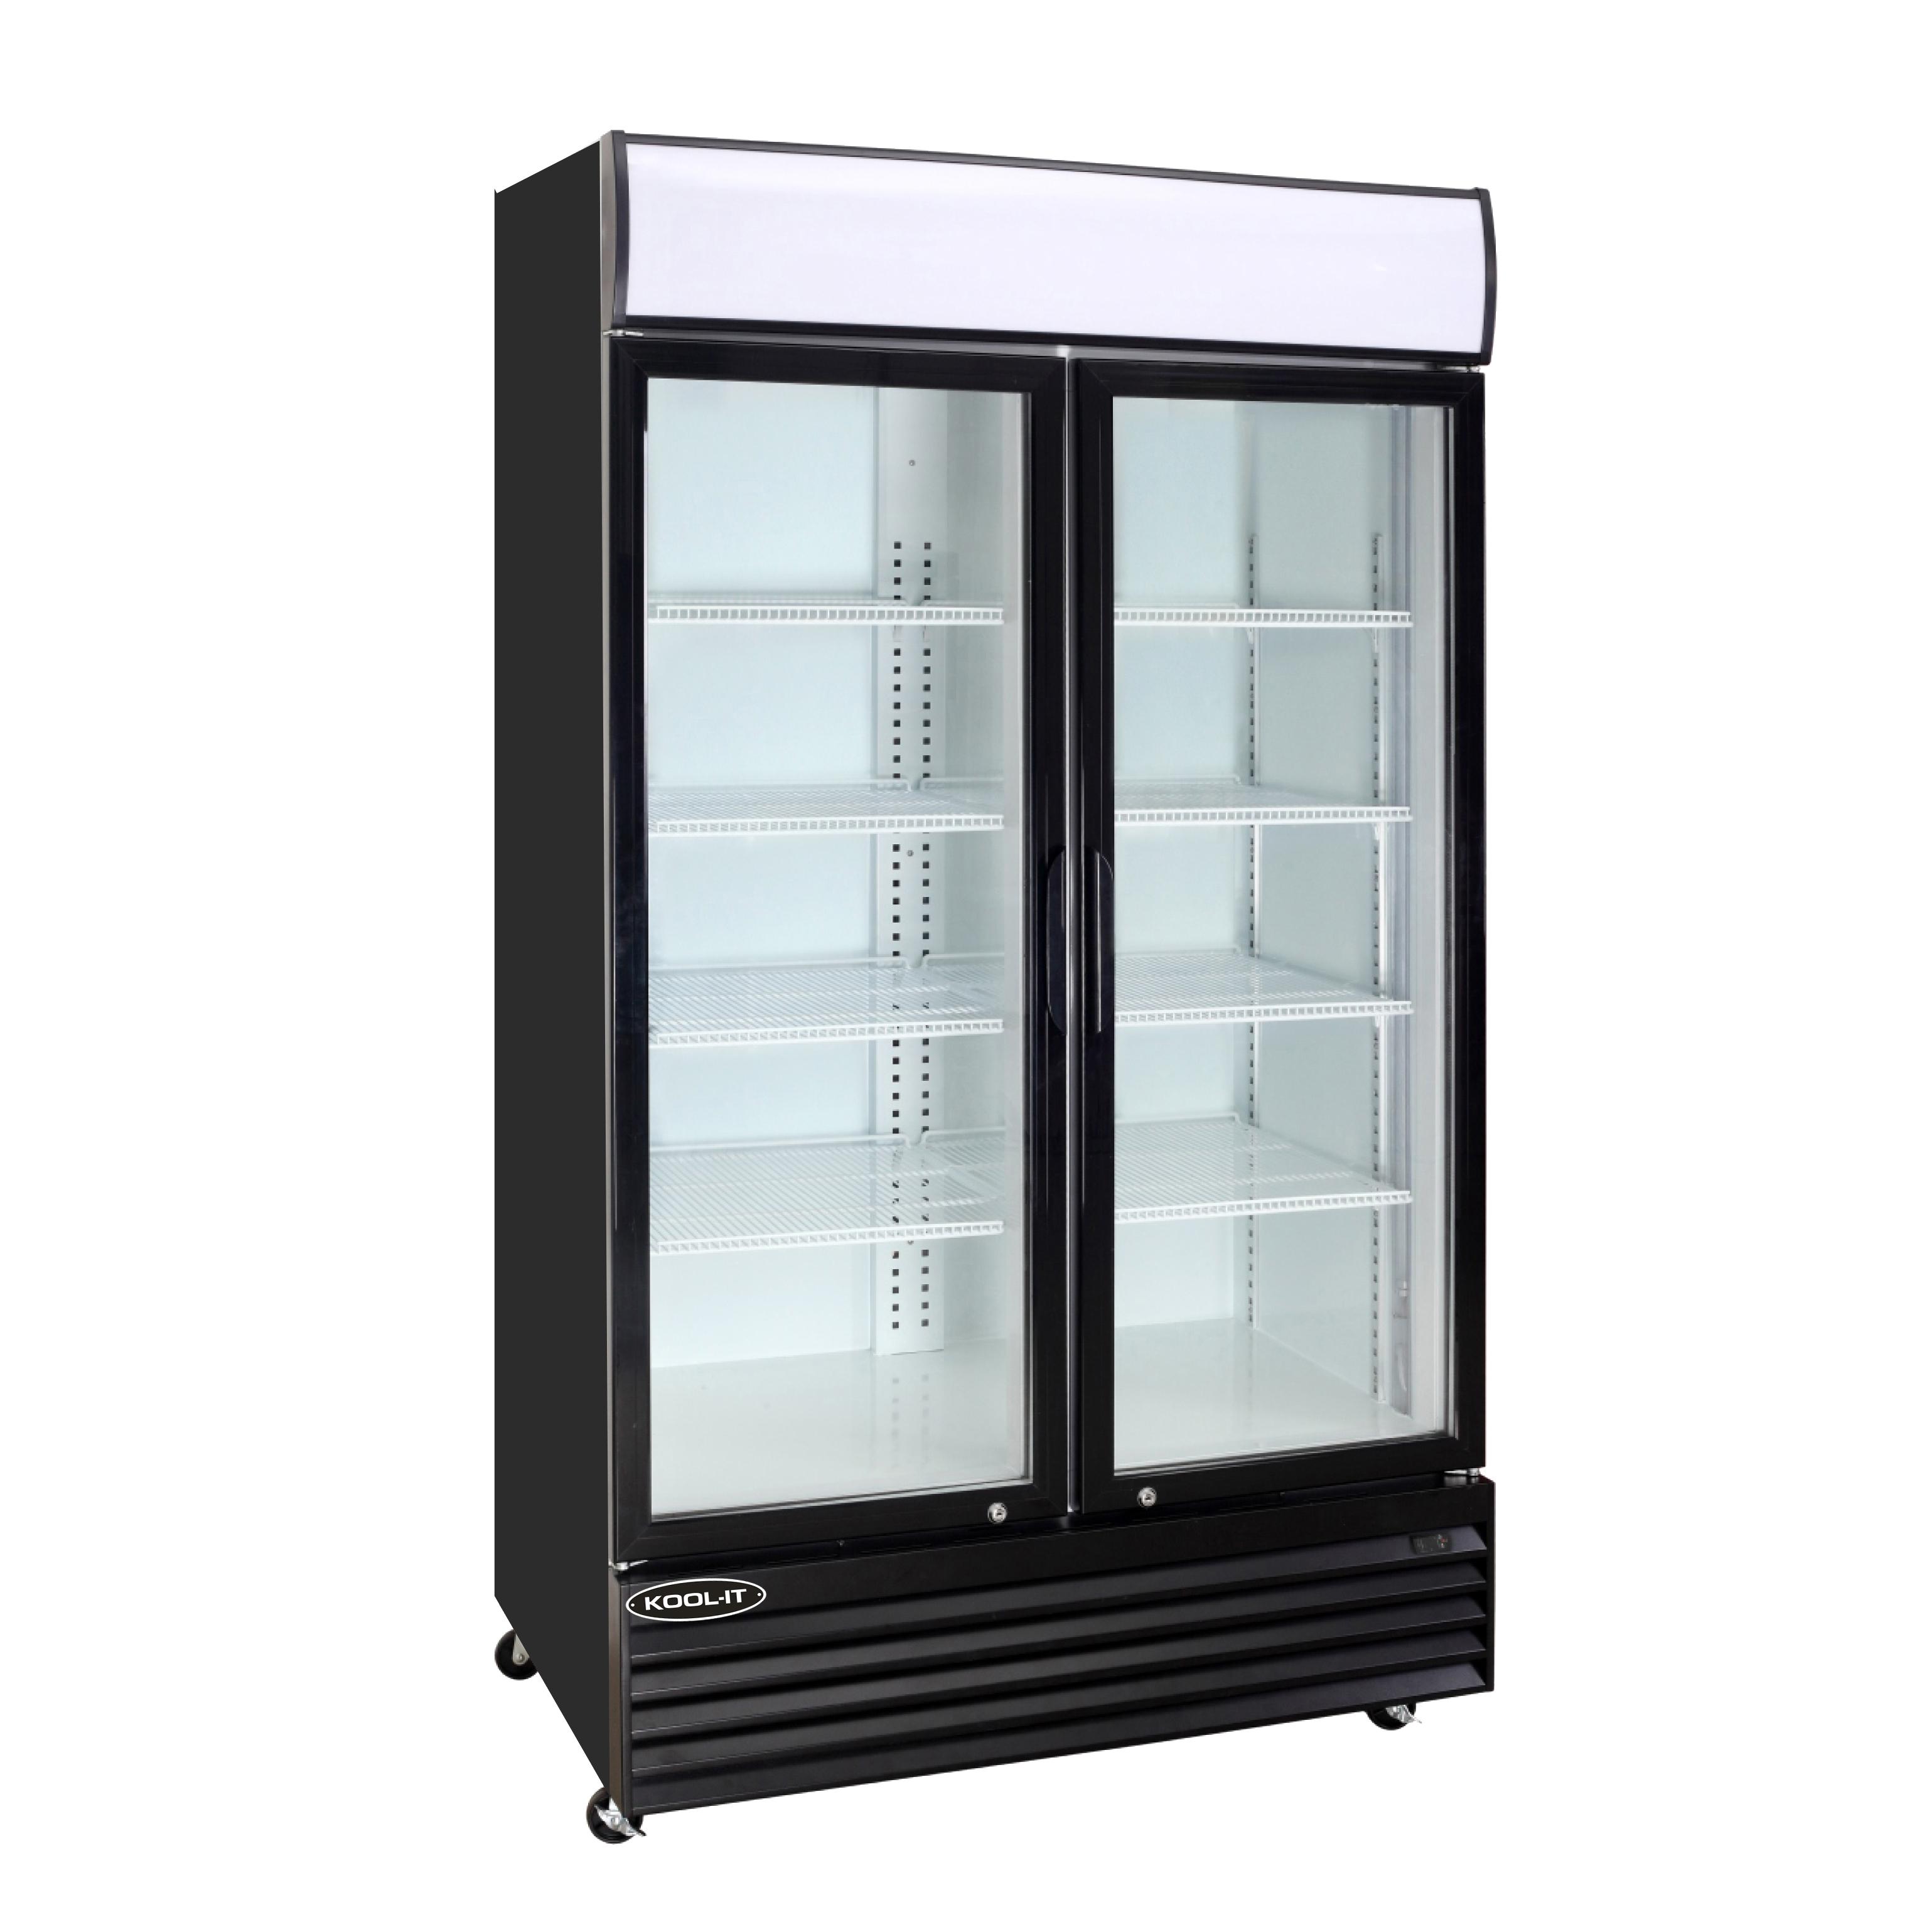 MVP KGM-36 refrigerator, merchandiser